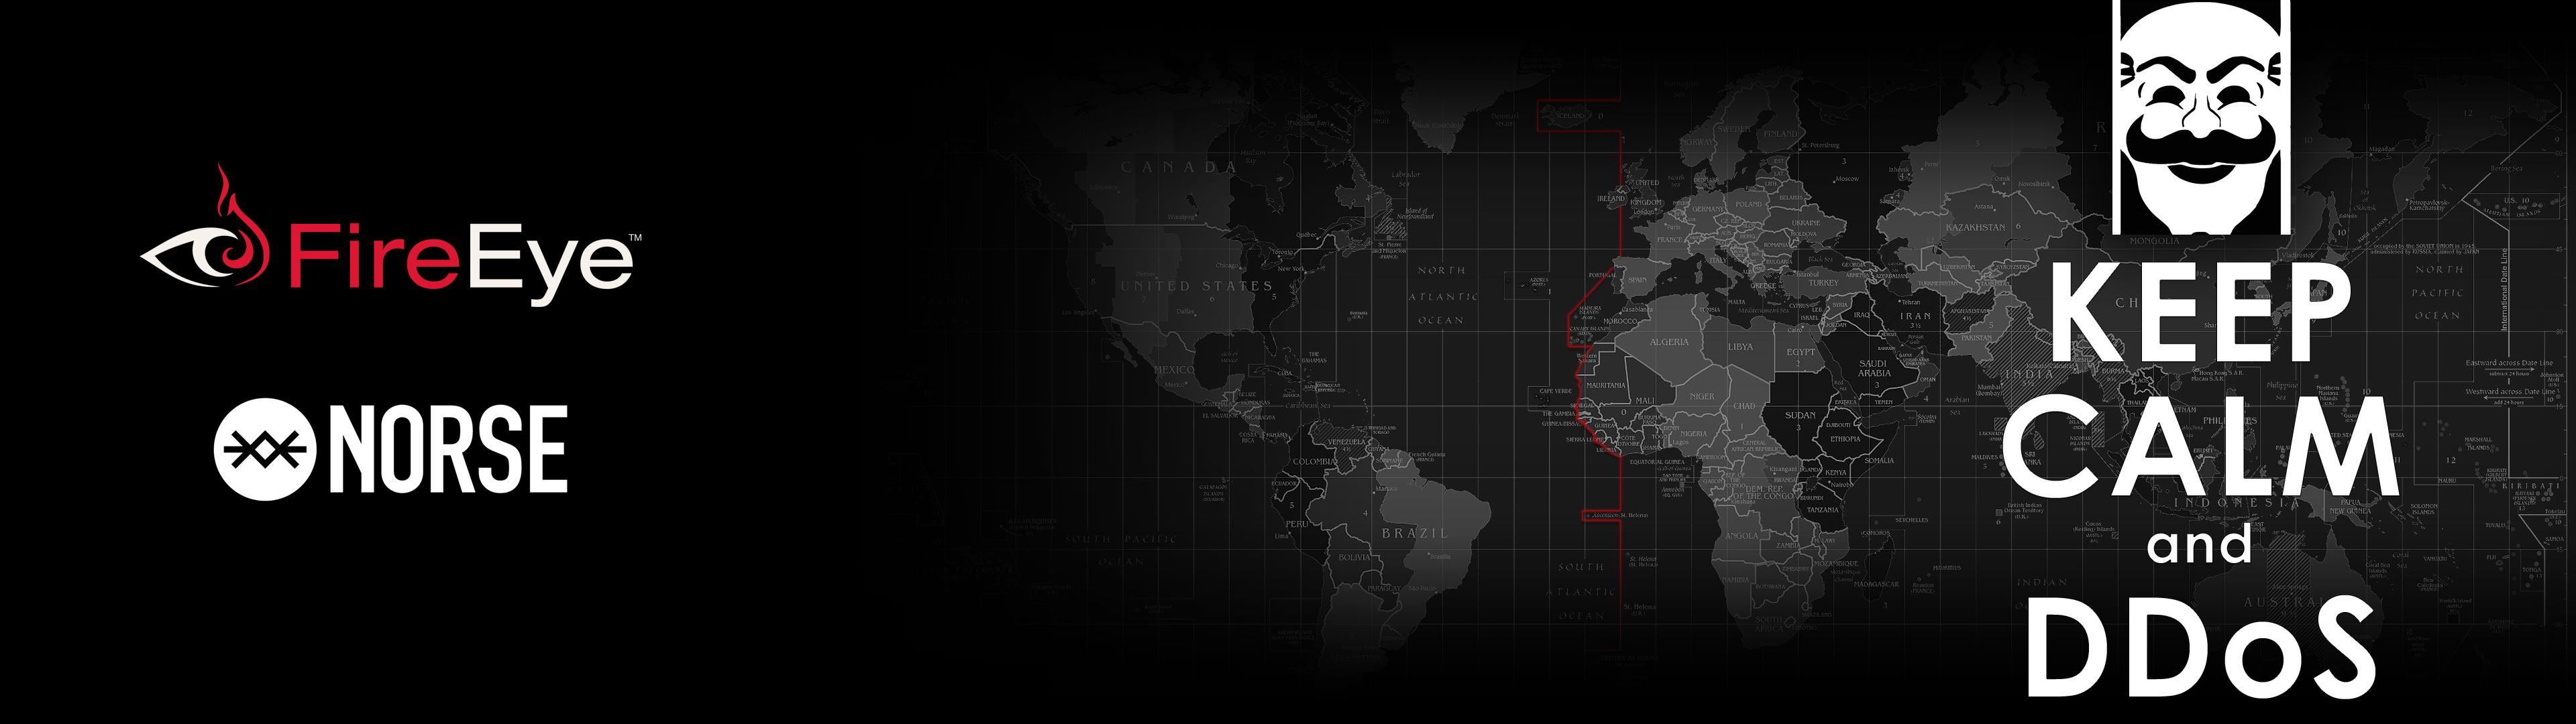 Wallpaper Text Mr Robot Map Hacking Brand Ddos